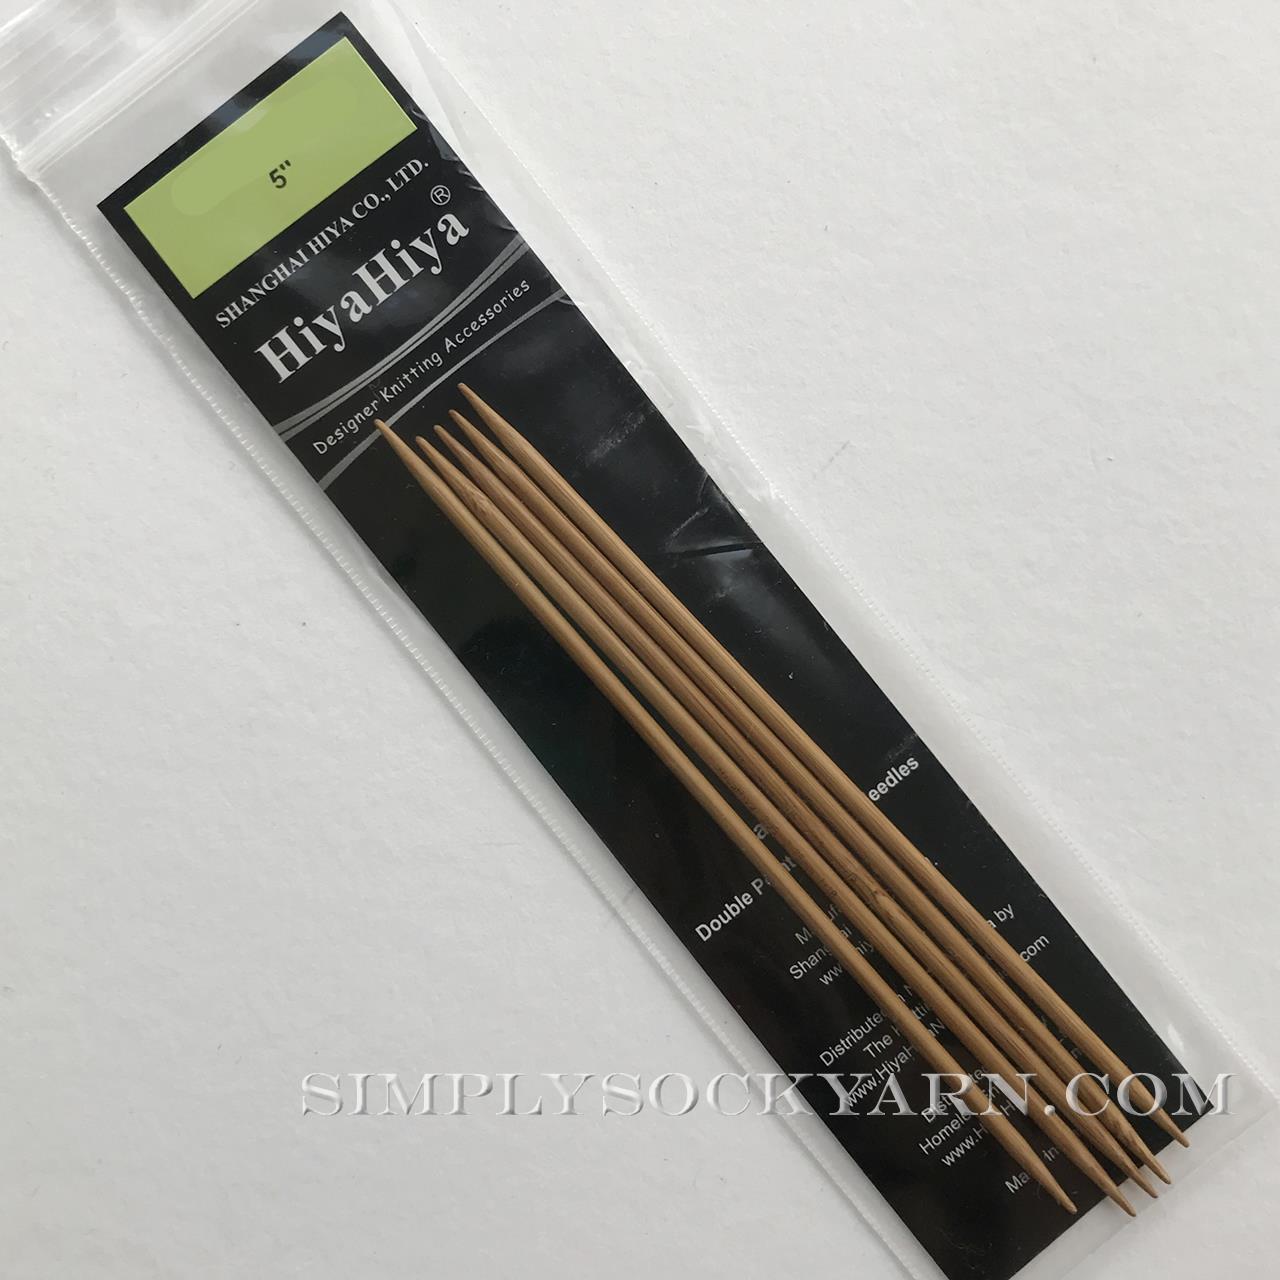 "Hiya 5"" DP Bamboo US 0 -"